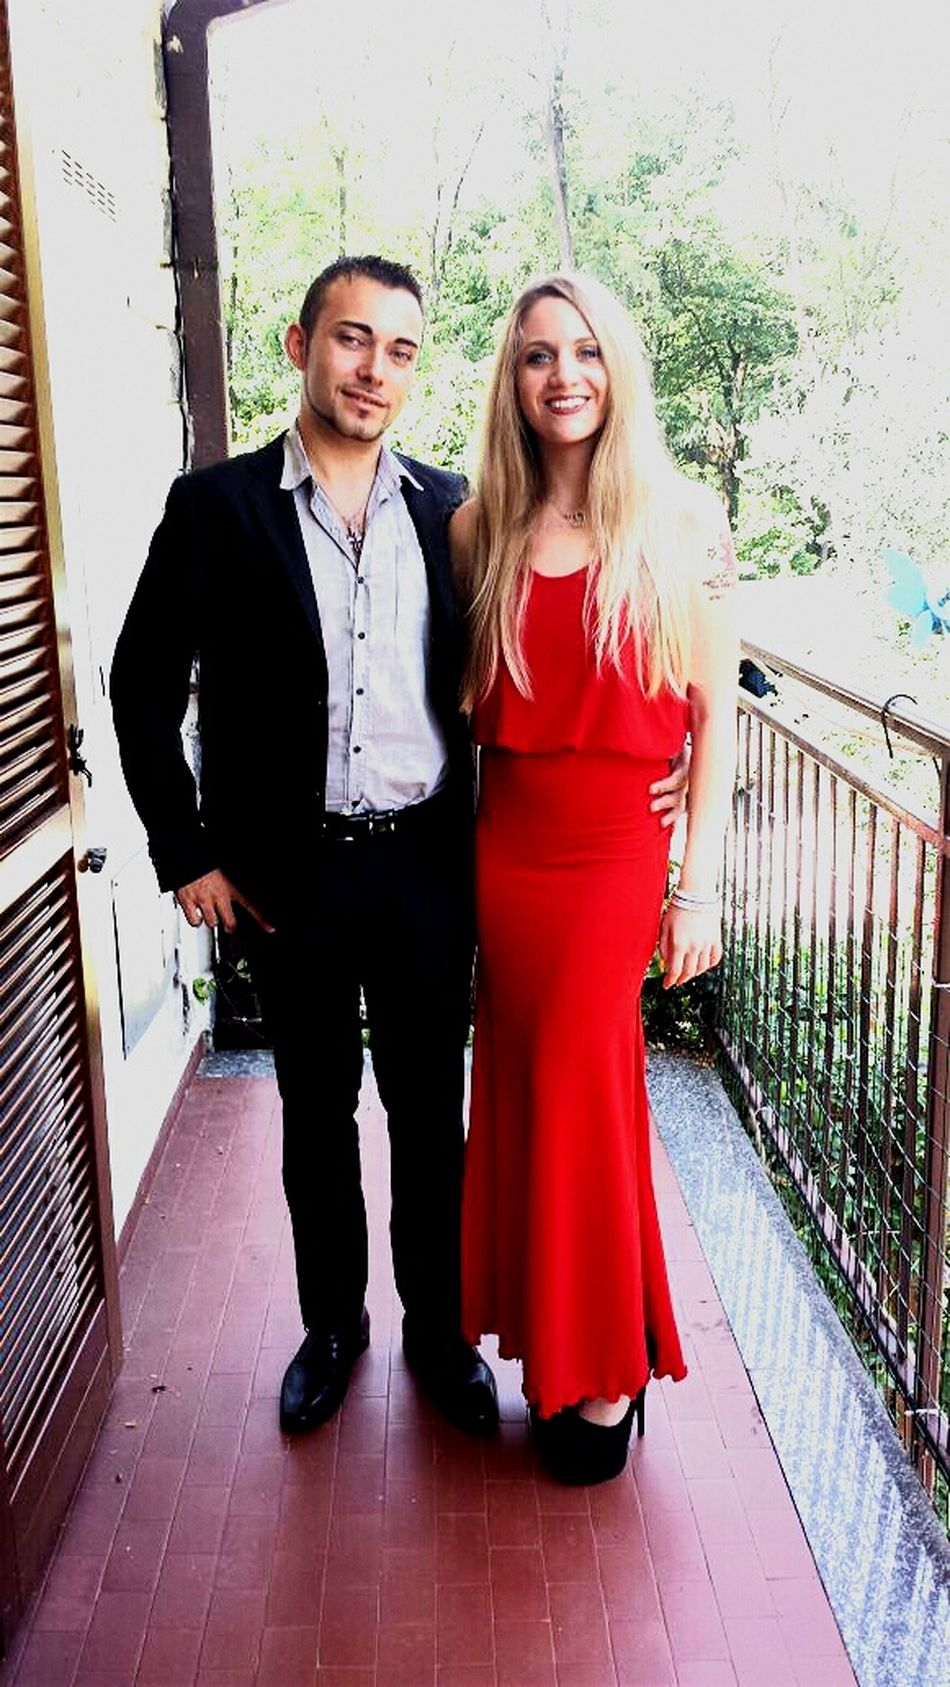 wedding day ♡ Wedding Reddress IoEte Aspettandoilnostro Quasi5annidinoi Tiamo❤️⚓️👏 Loveyousomuch❤❤❤